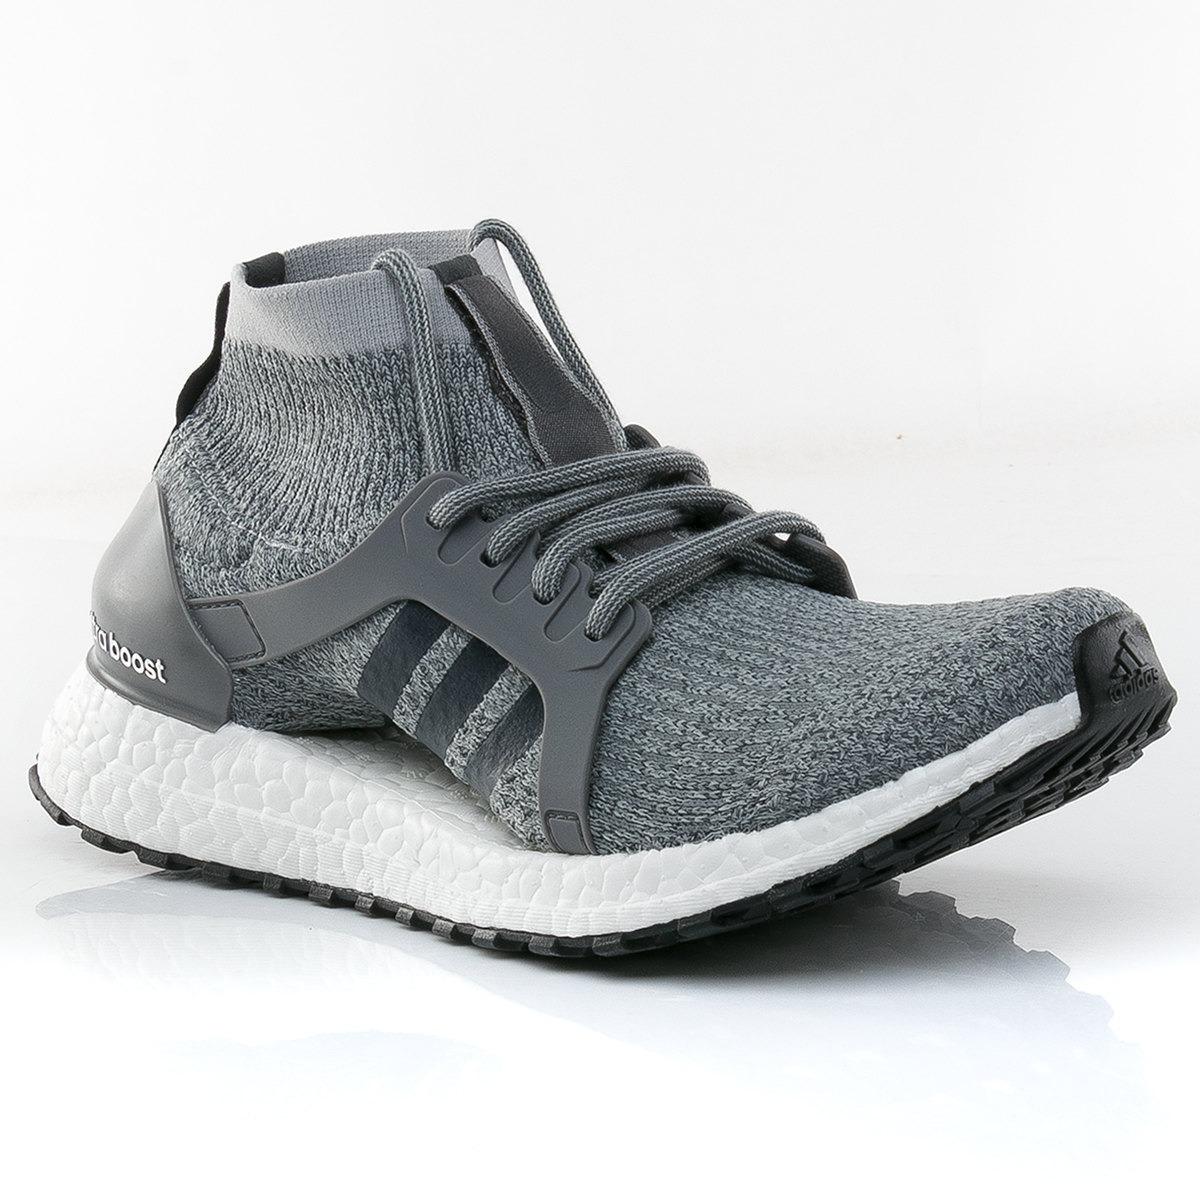 adidas Zapatillas de running UltraBOOST X All Terrain Gris | adidas Argentina